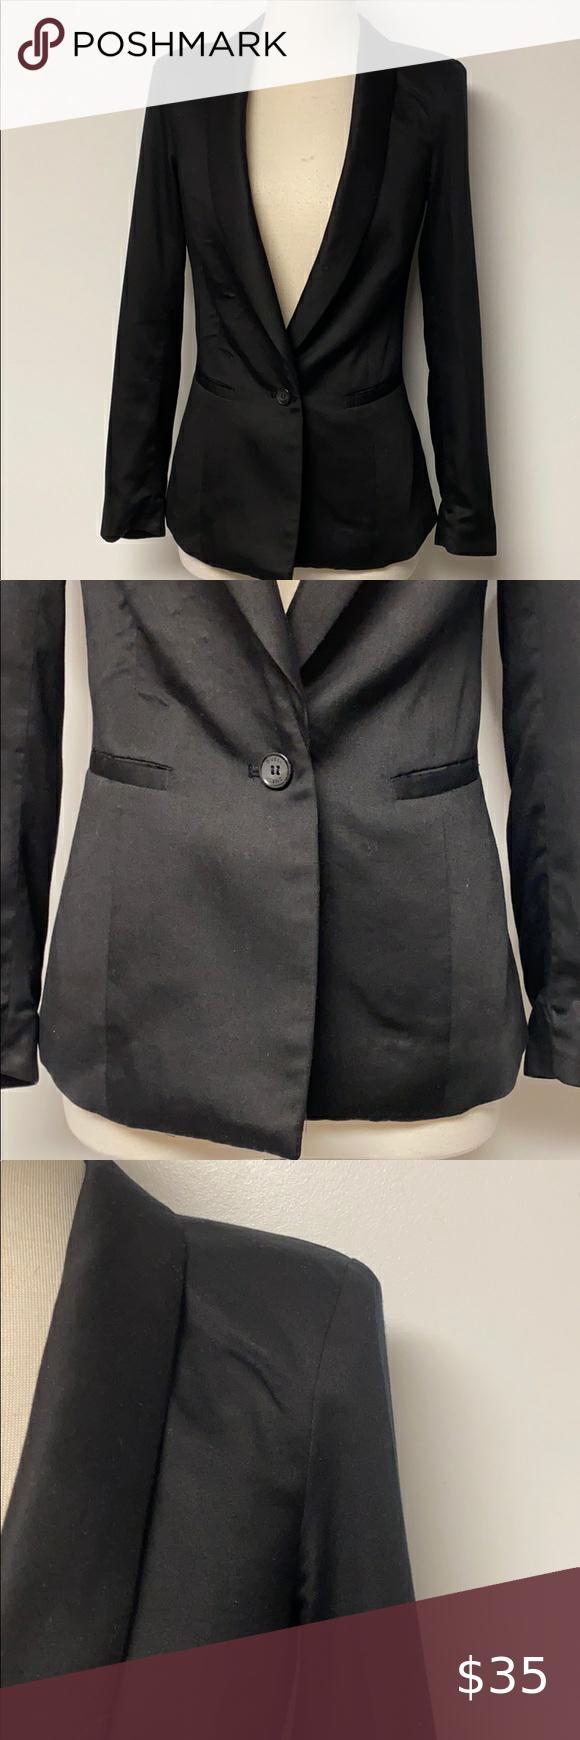 Black Guess Blazer Black Lace Jacket All Black Tuxedo Black Dress Jacket [ 1740 x 580 Pixel ]